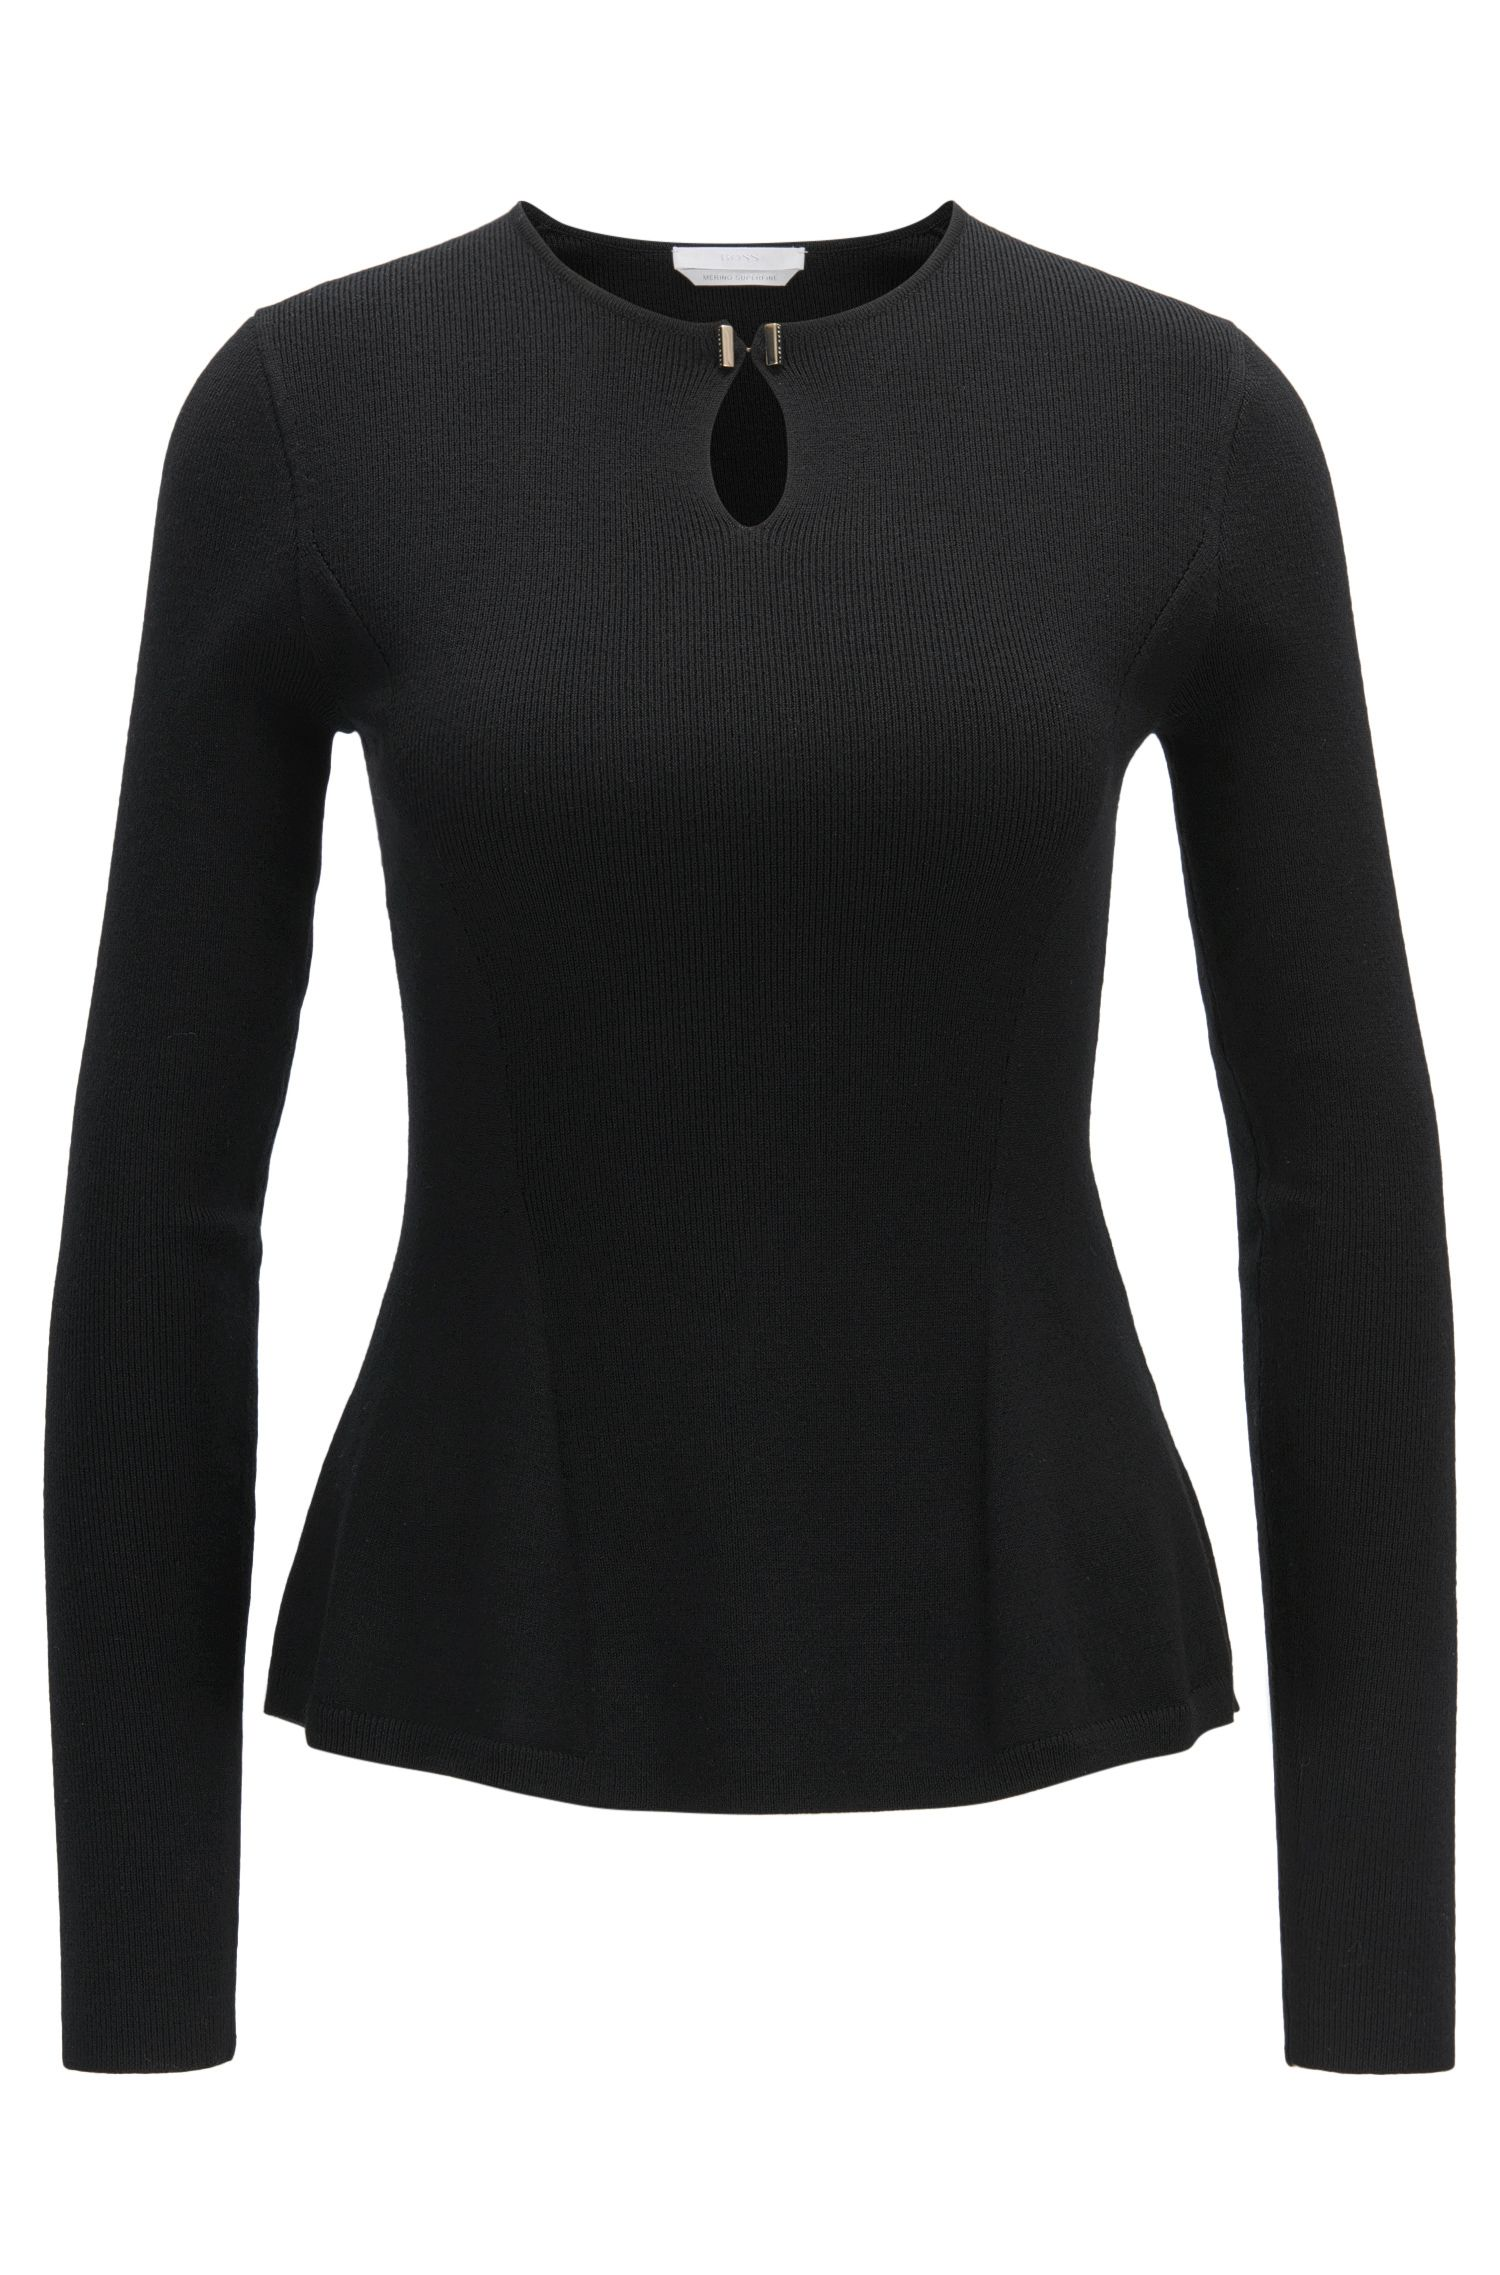 Mercerized Virgin Wool Peplum Sweater | Filga, Black